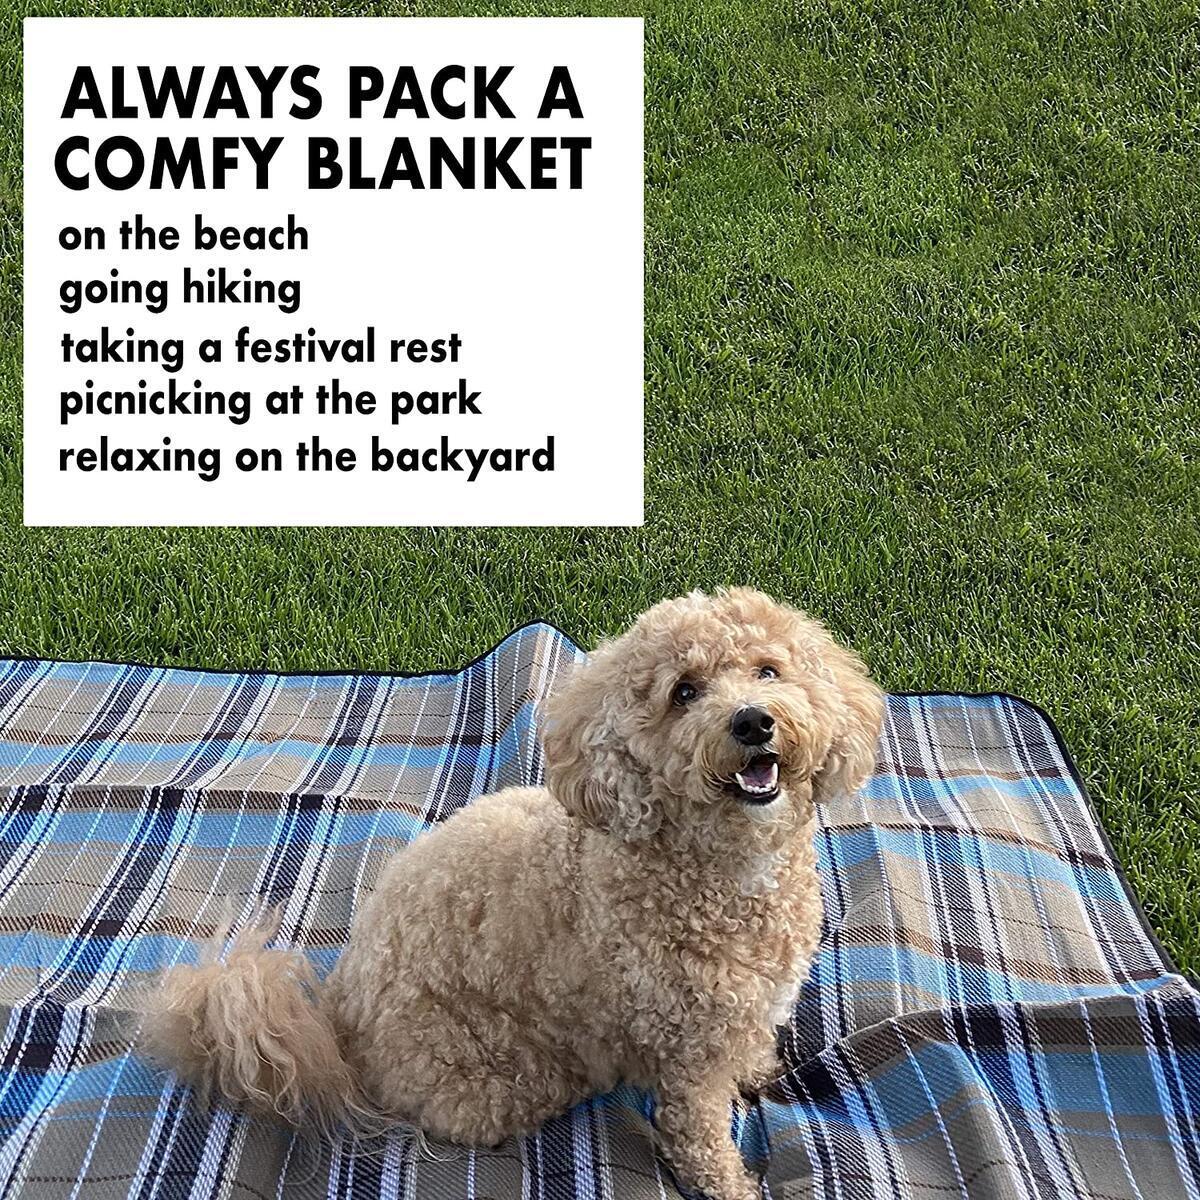 Beach Blanket Sand Proof, Water Proof Picnic Blanket. Large 59x59 Inch Padded Outdoor Blanket. Beach Mat, Camping Blanket, Park, Festival or Stadium Blanket. Waterproof, Sand Free